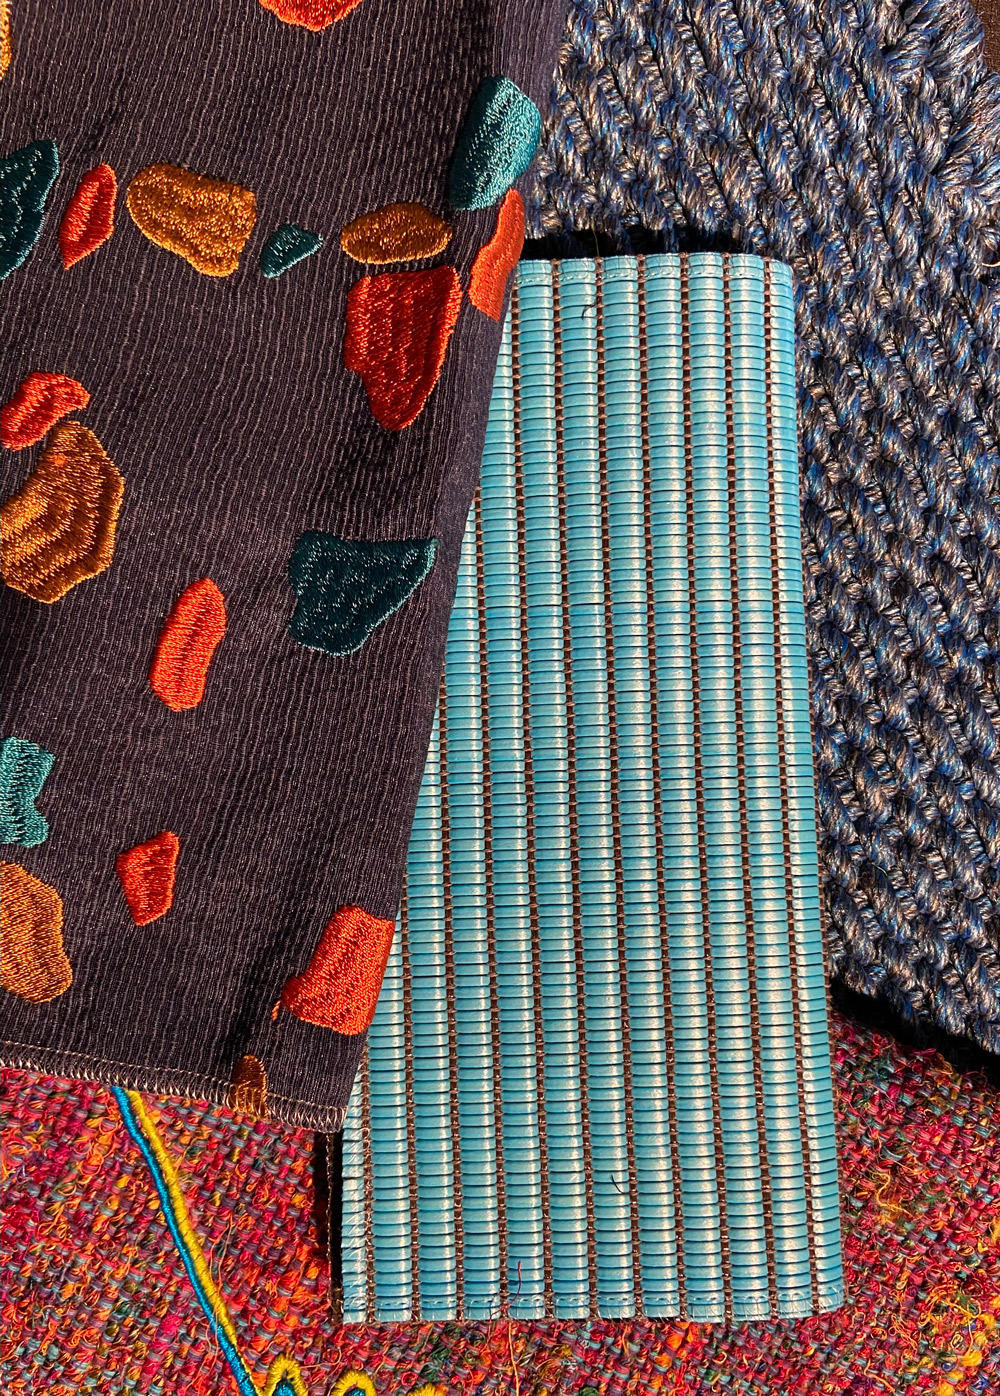 daniel dubay textile design